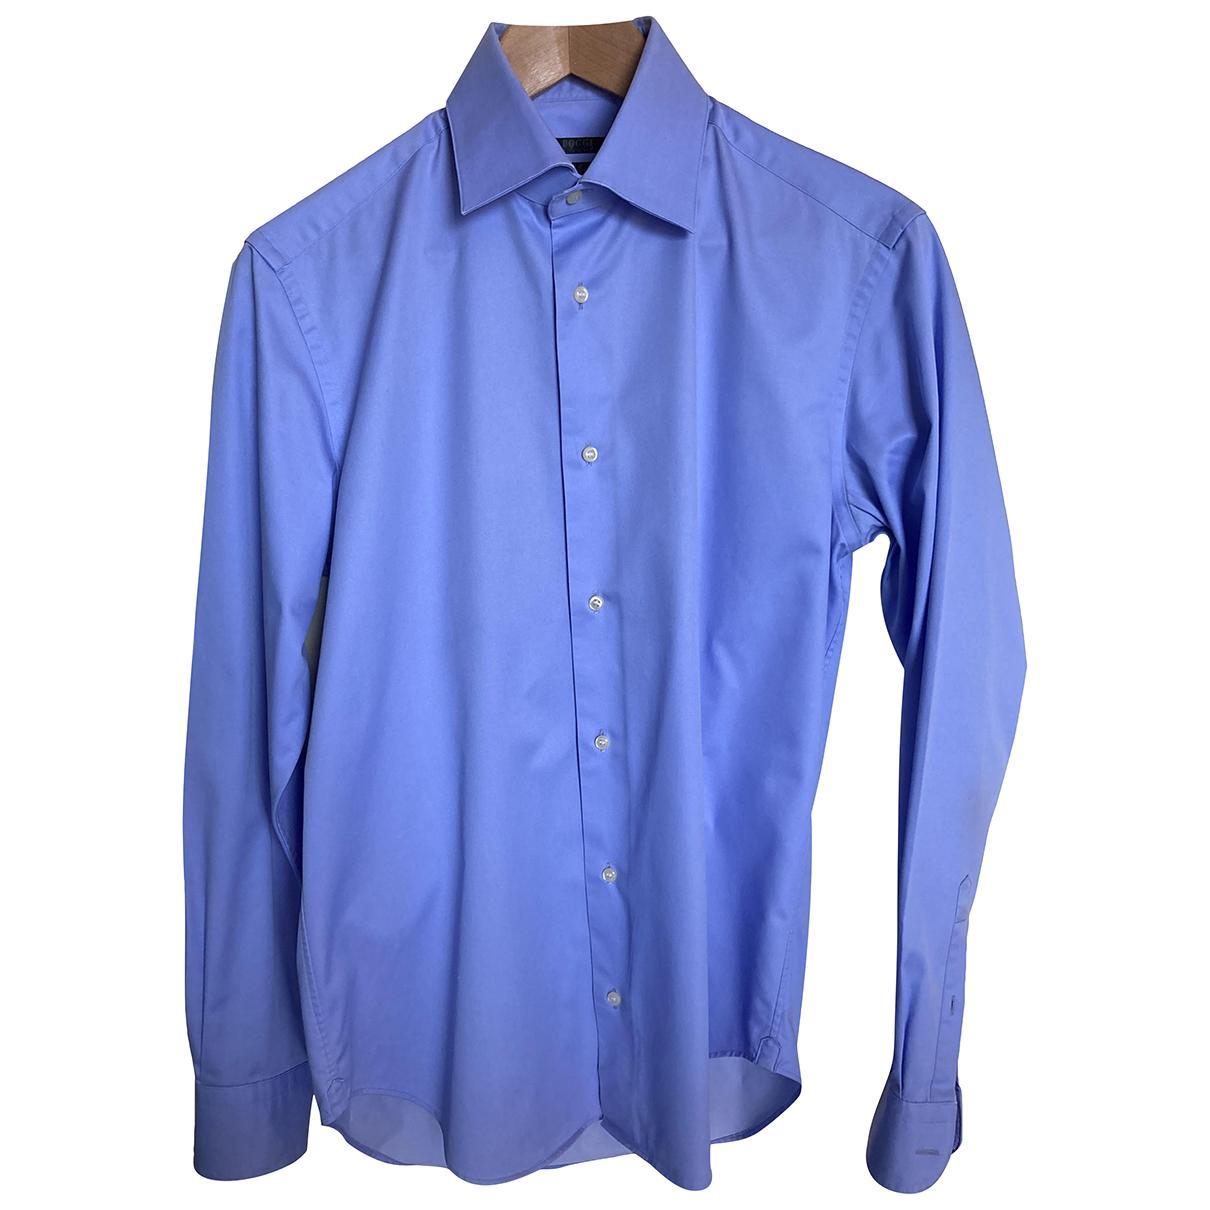 Boggi N Blue Cotton Shirts for Men 39 EU (tour de cou / collar)